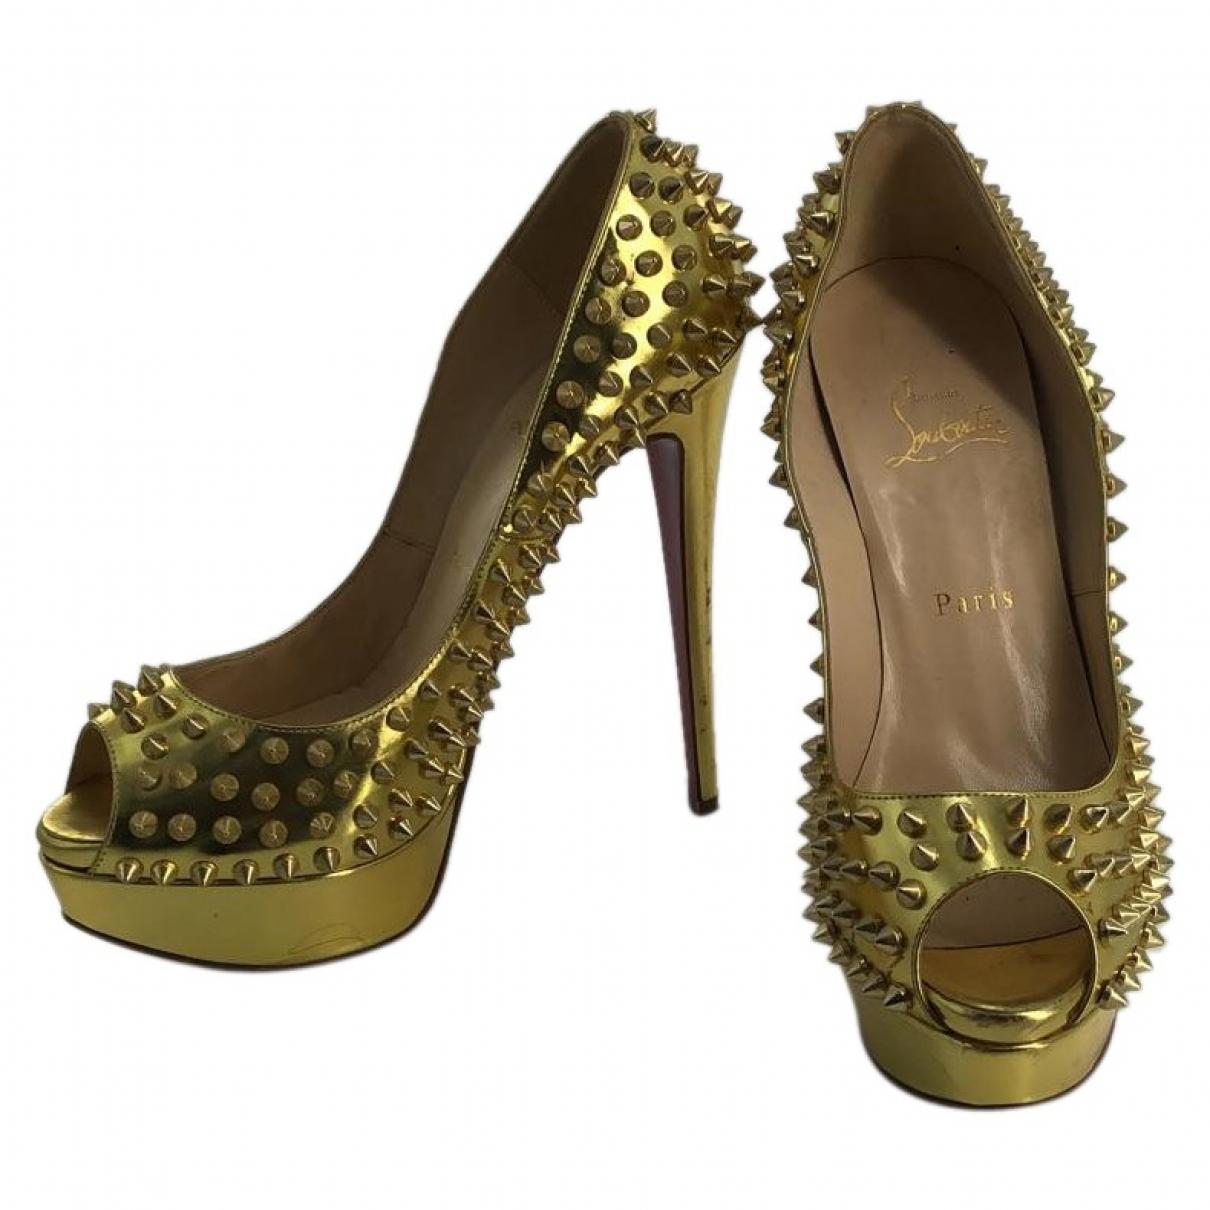 Christian Louboutin Lady Peep Gold Patent leather Heels for Women 39 EU